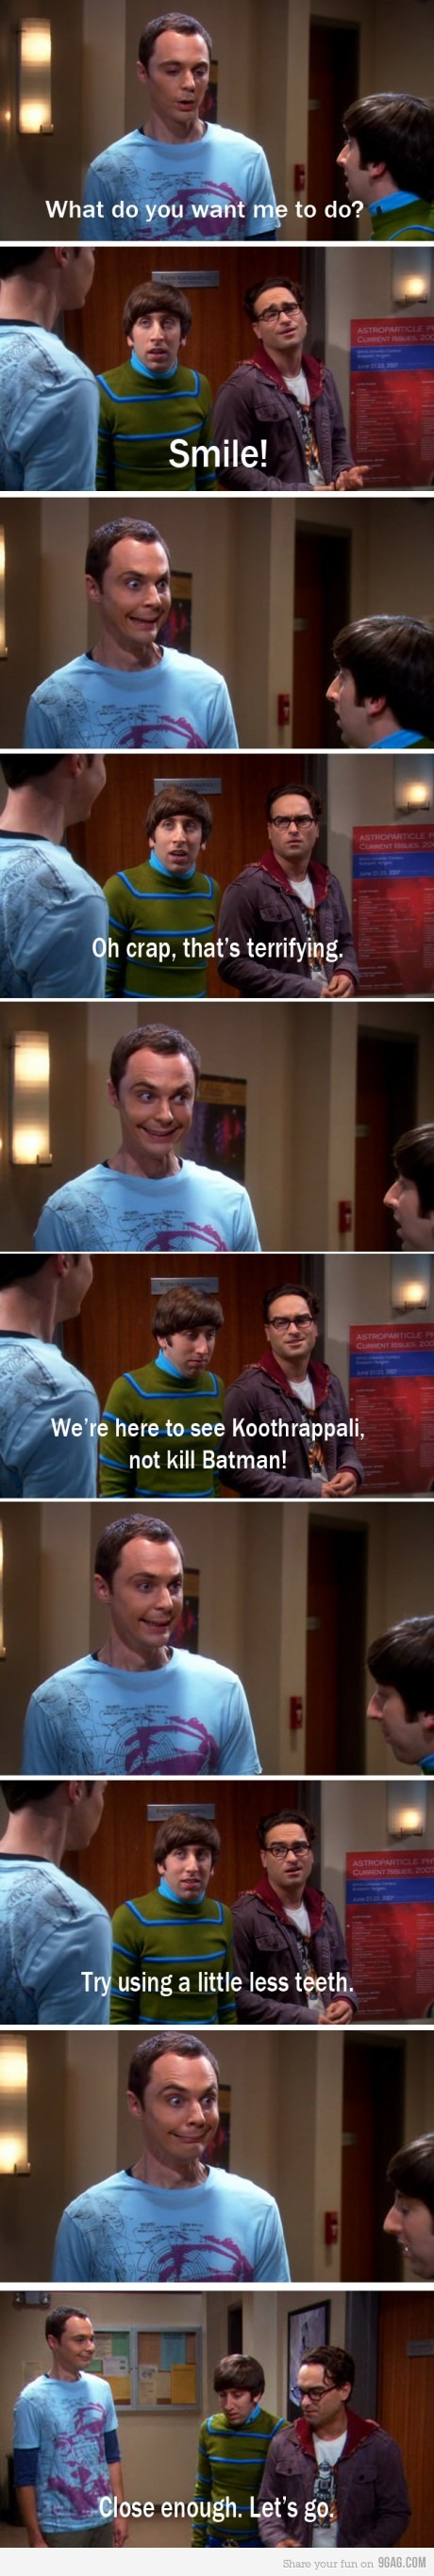 Sheldon lol